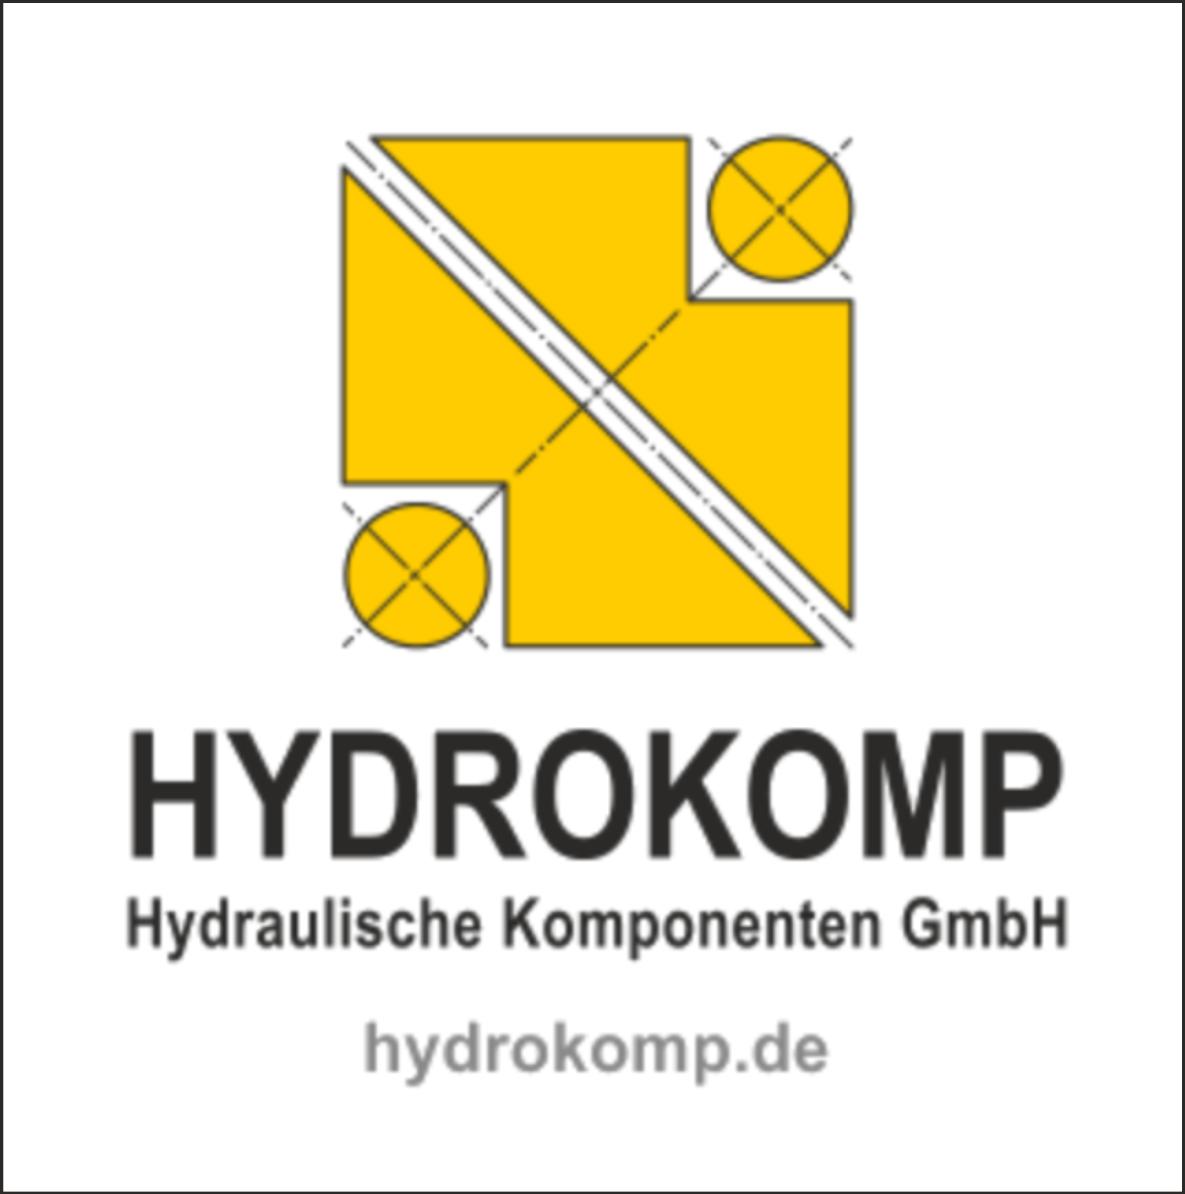 Hydrokomp